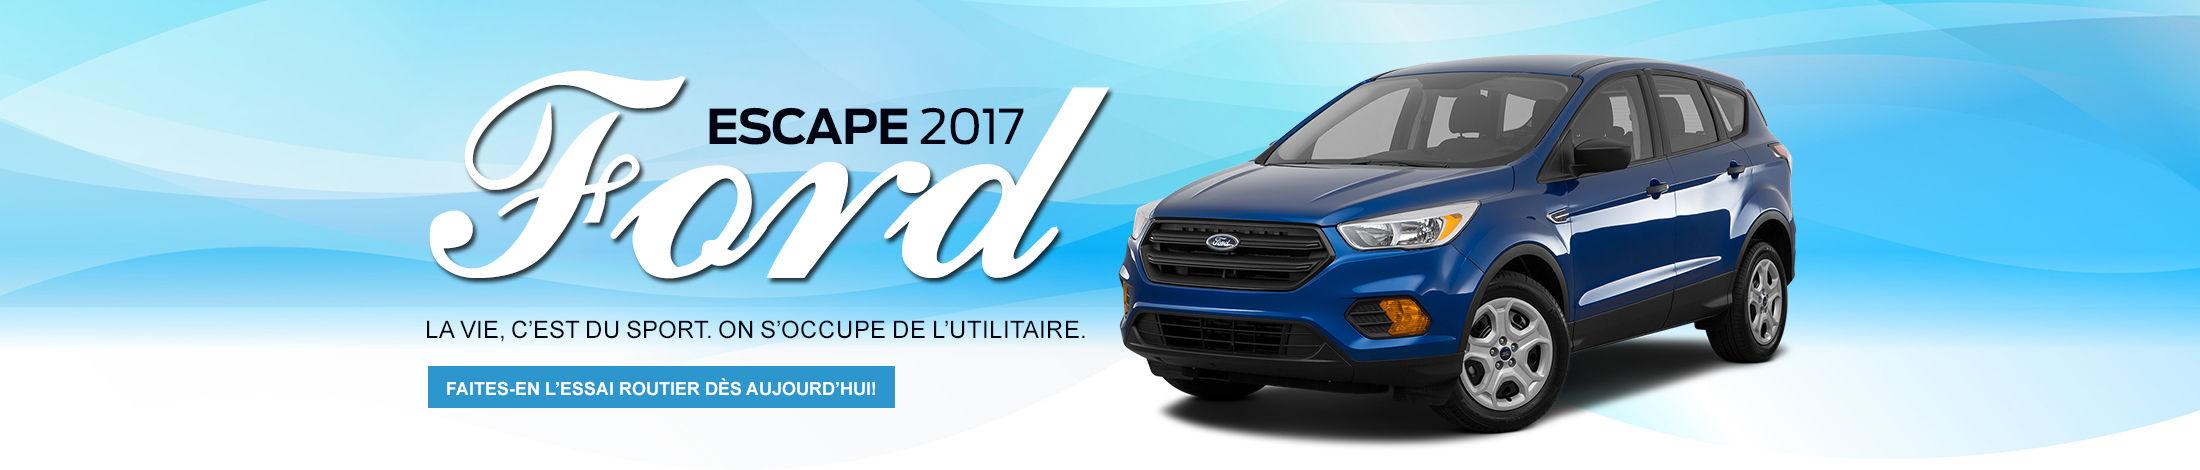 Header Escape 2017